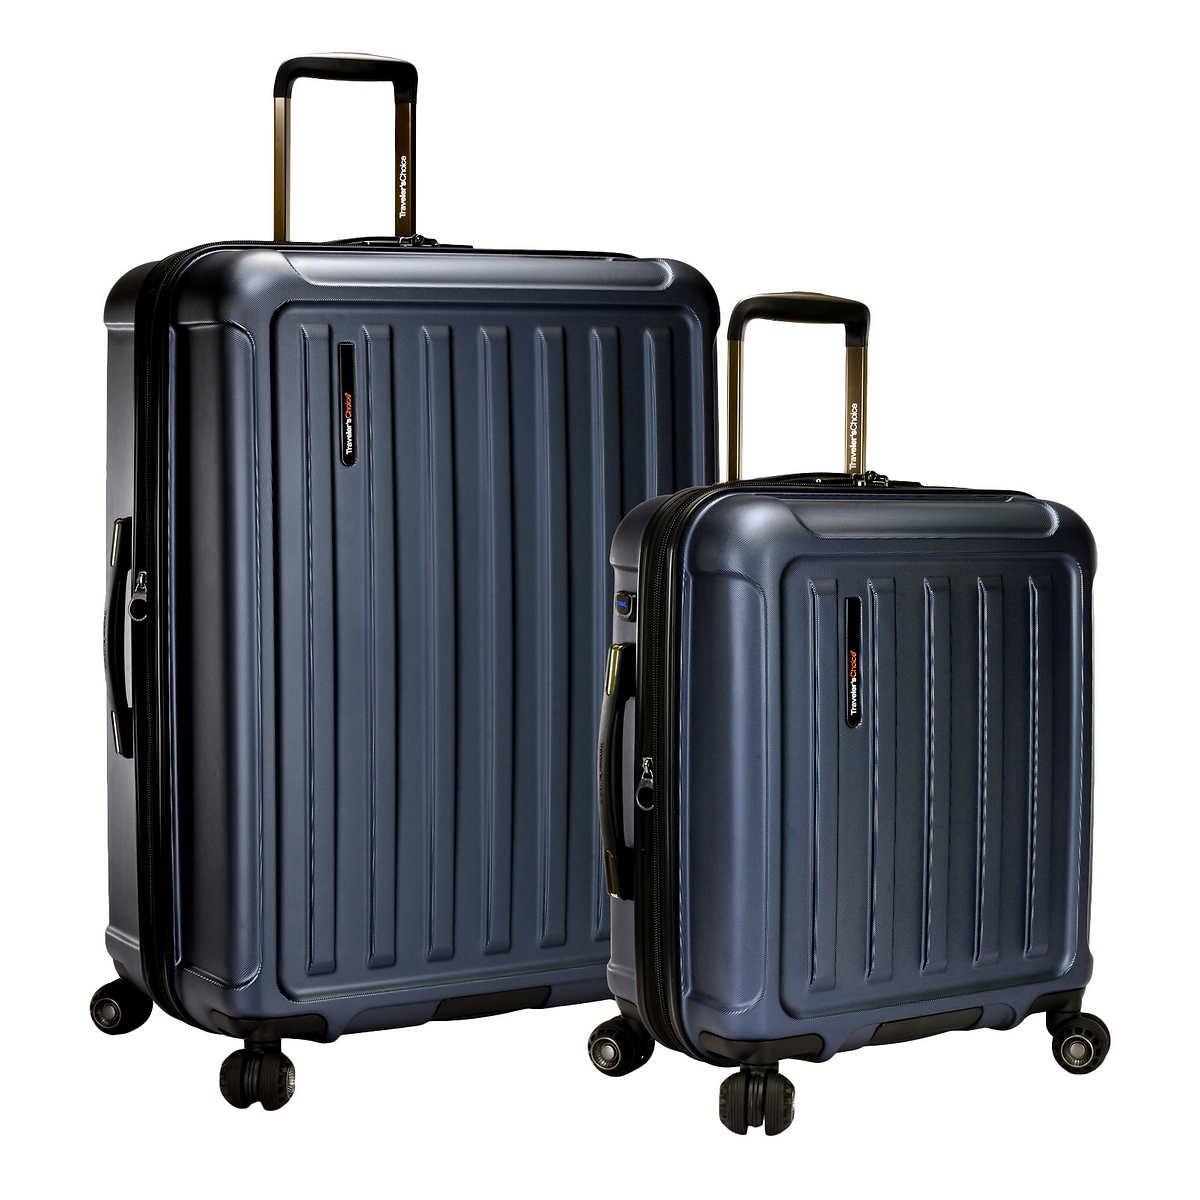 Traveler's Choice The Art of Travel 2-piece Hardside Spinner Set, 29'' & 21'' (Blue)